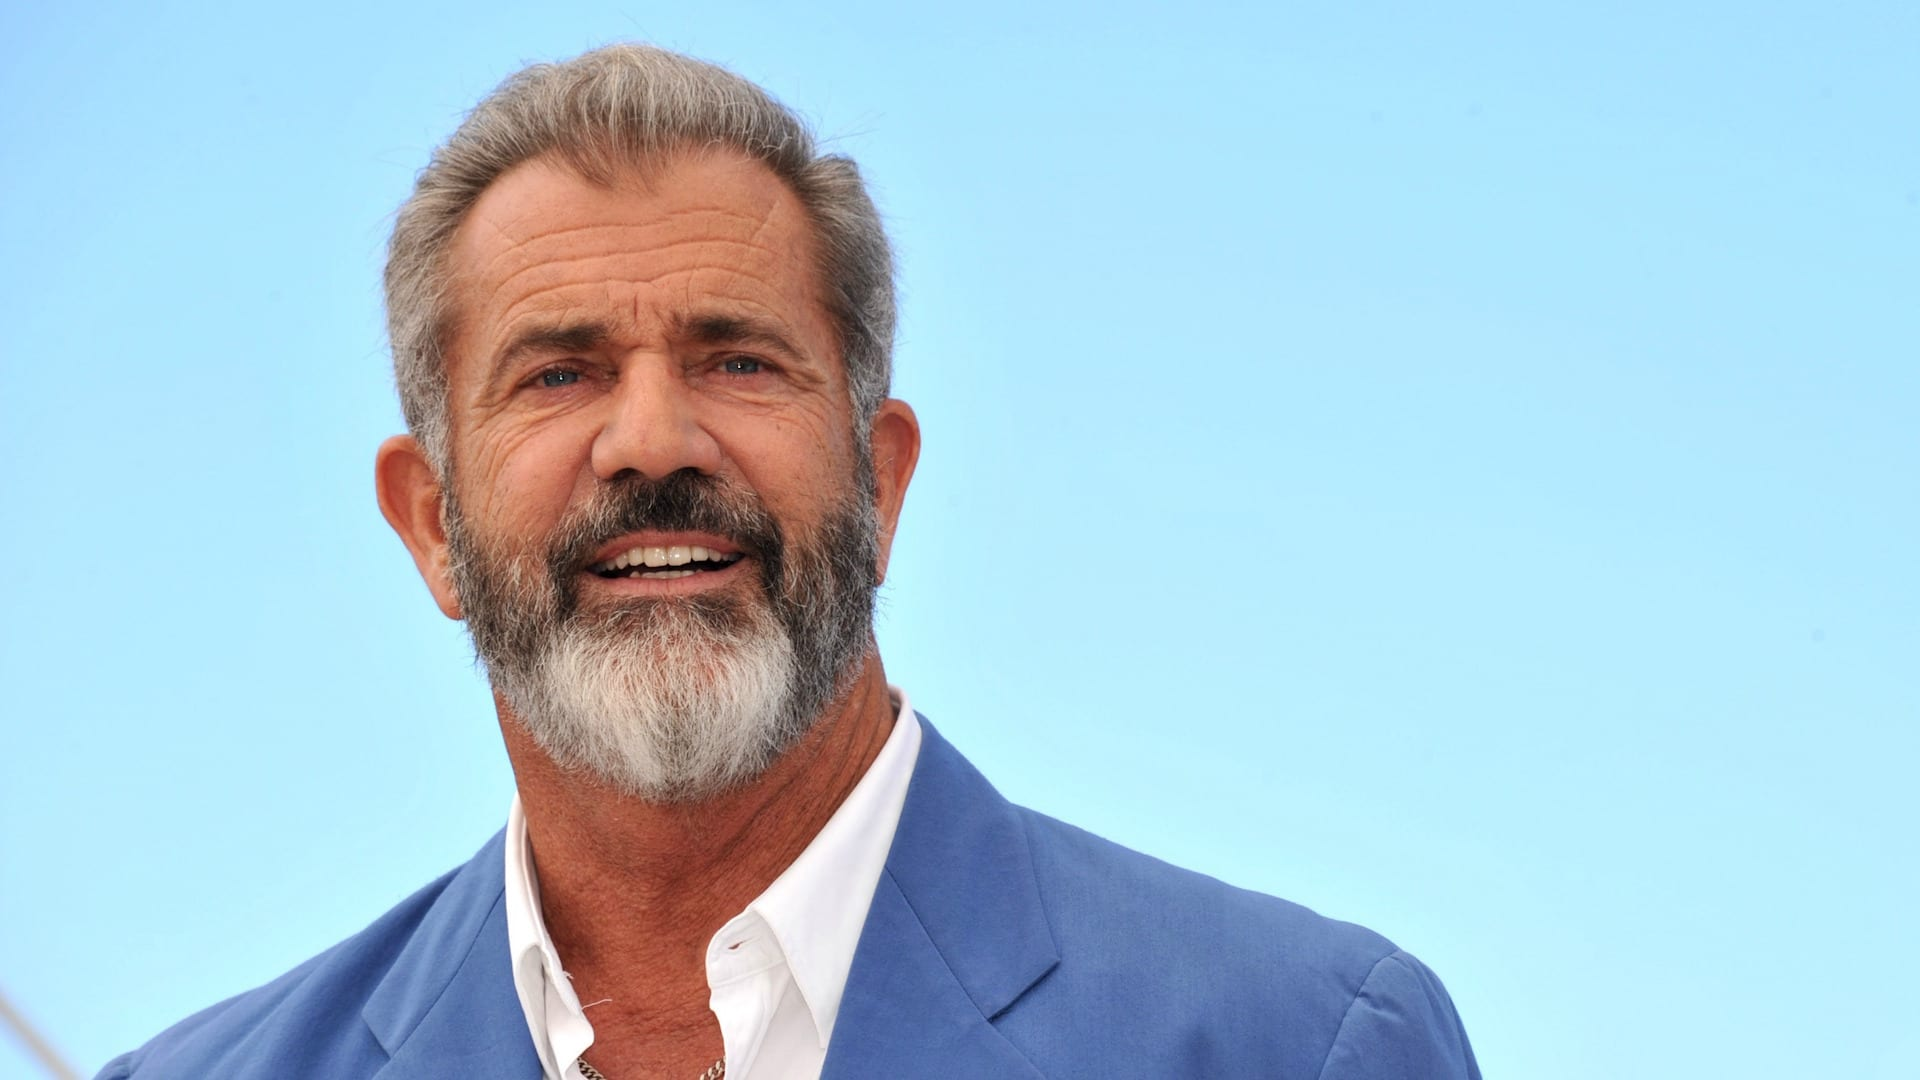 Mel Gibson Net worth, Height, Age, Bio, Wife, Family ...